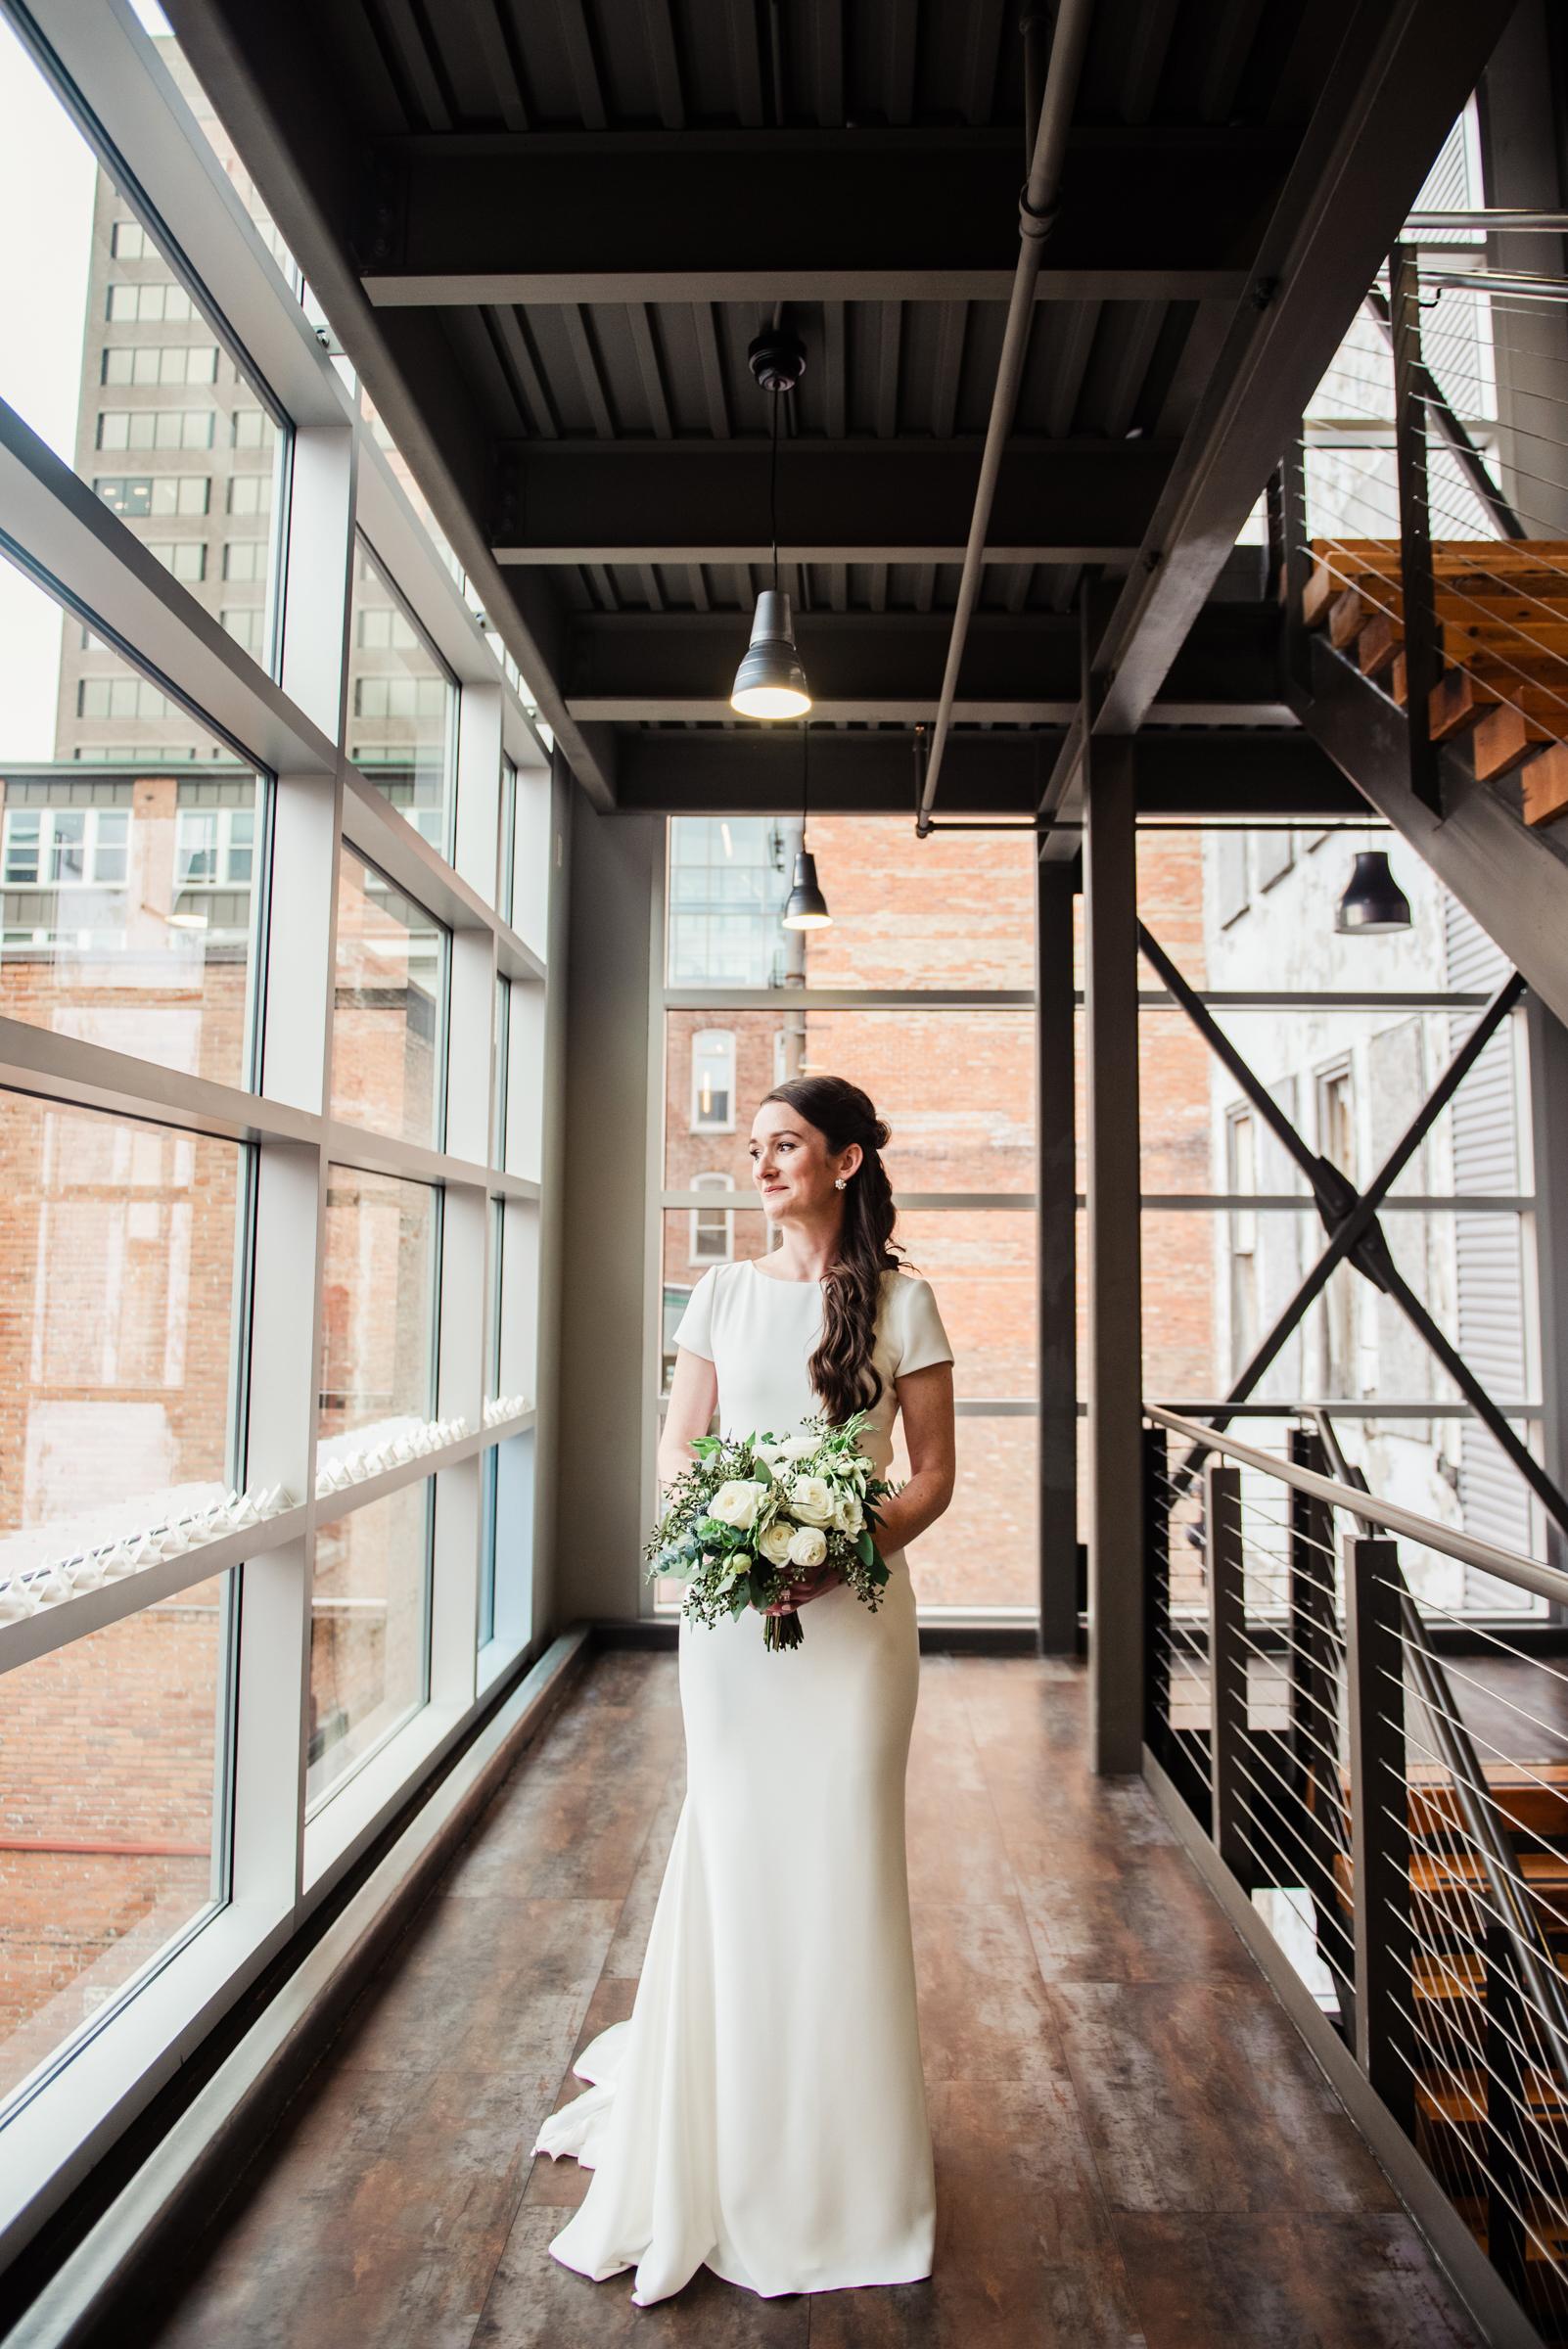 SKY_Armory_Syracuse_Wedding_JILL_STUDIO_Rochester_NY_Photographer_DSC_5771.jpg